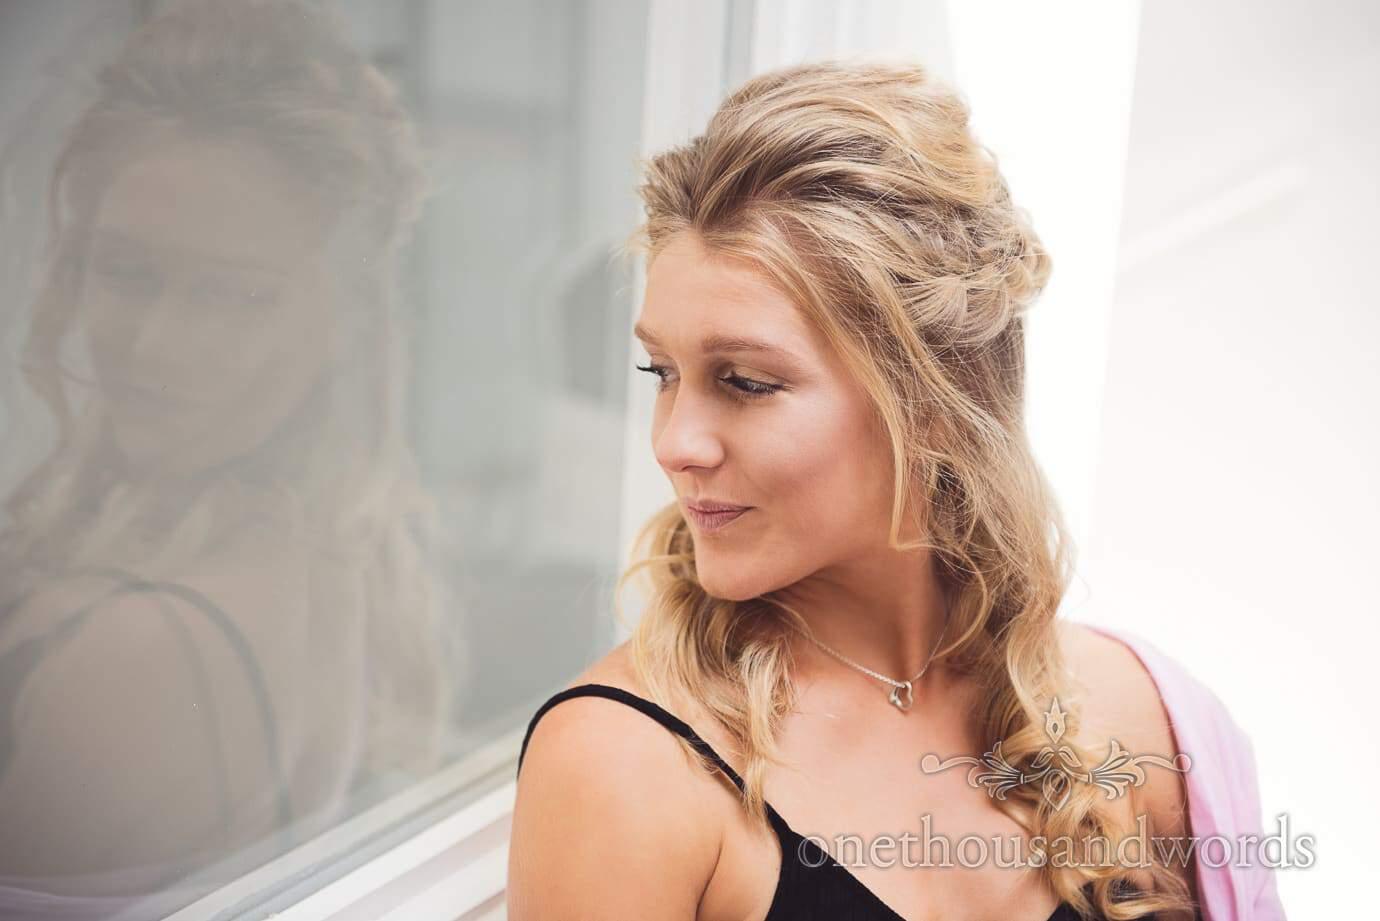 Bridesmaid in wedding make-up looks through beauty salon window on wedding morning